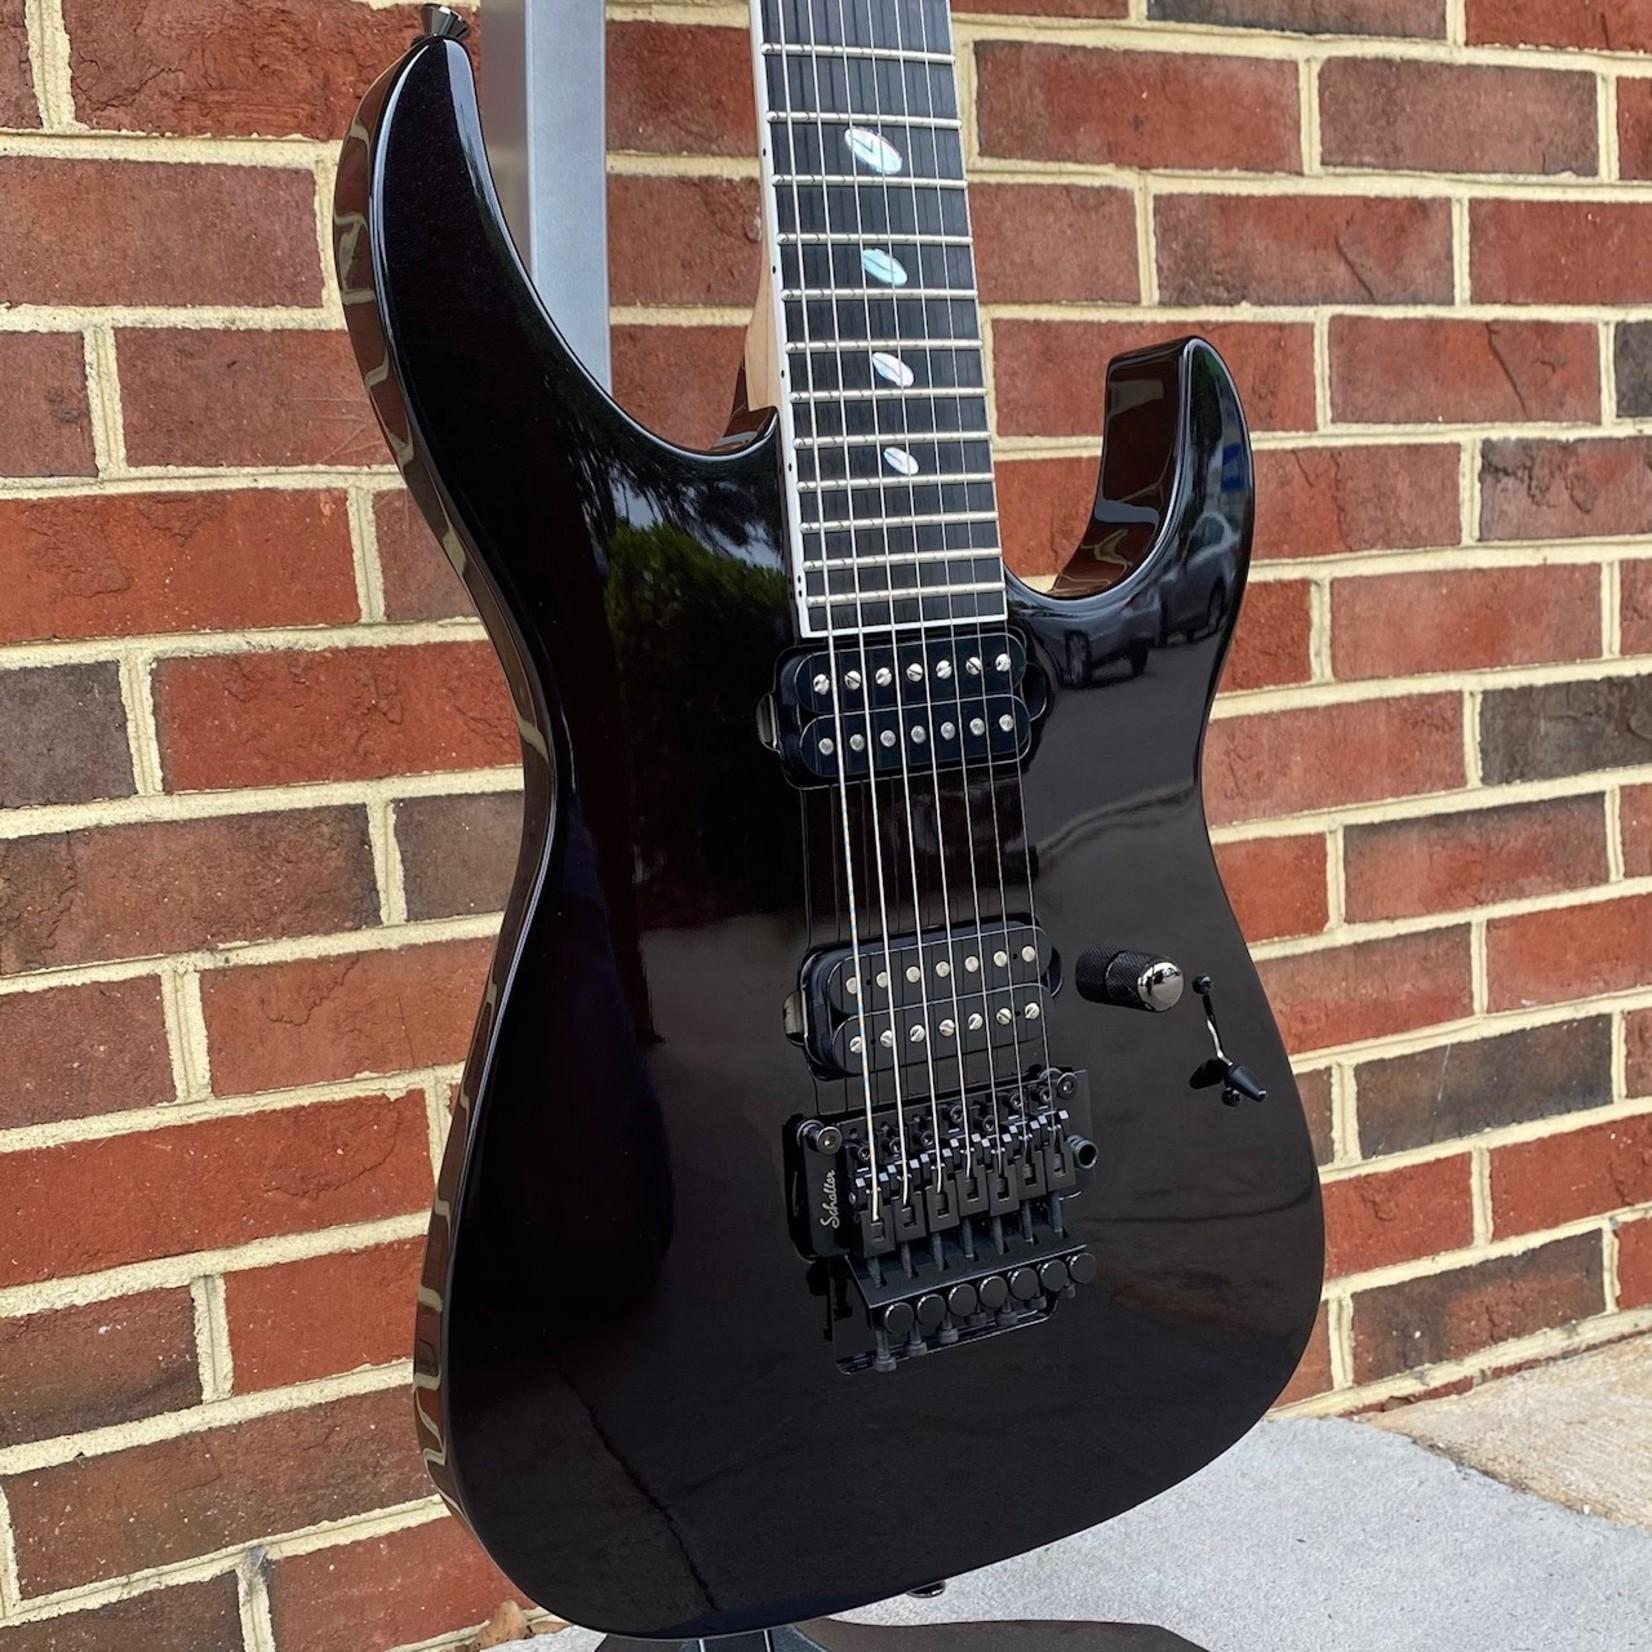 Caparison Guitars Caparison Dellinger 7 Prominence, Trans Spectrum Black, 7-String